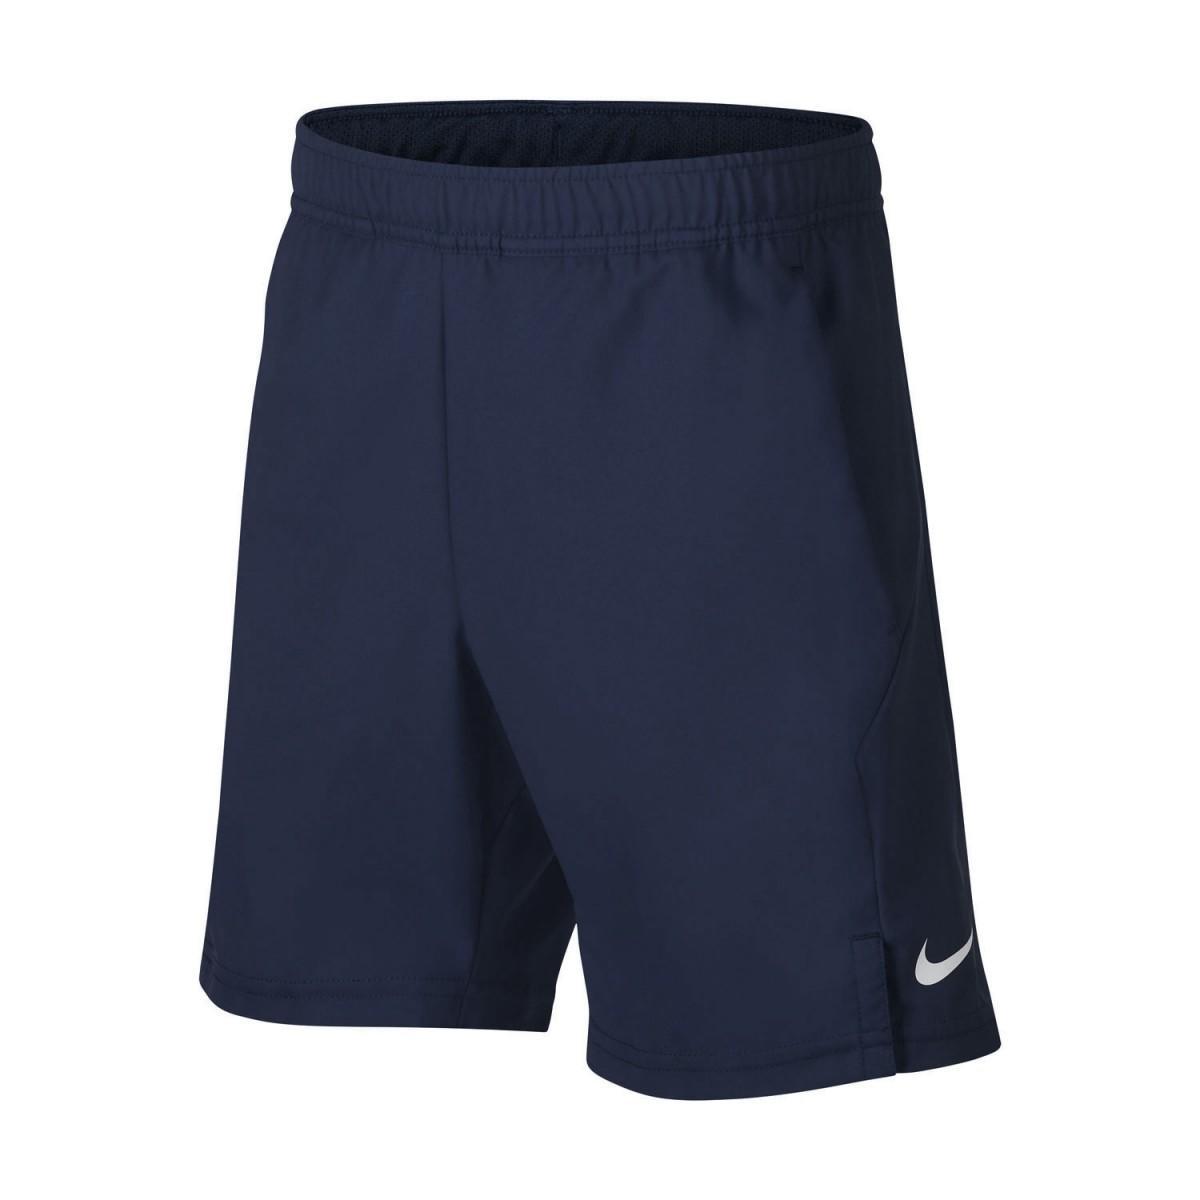 Теннисные шорты детские Nike B Court Dry Short obsidian/white